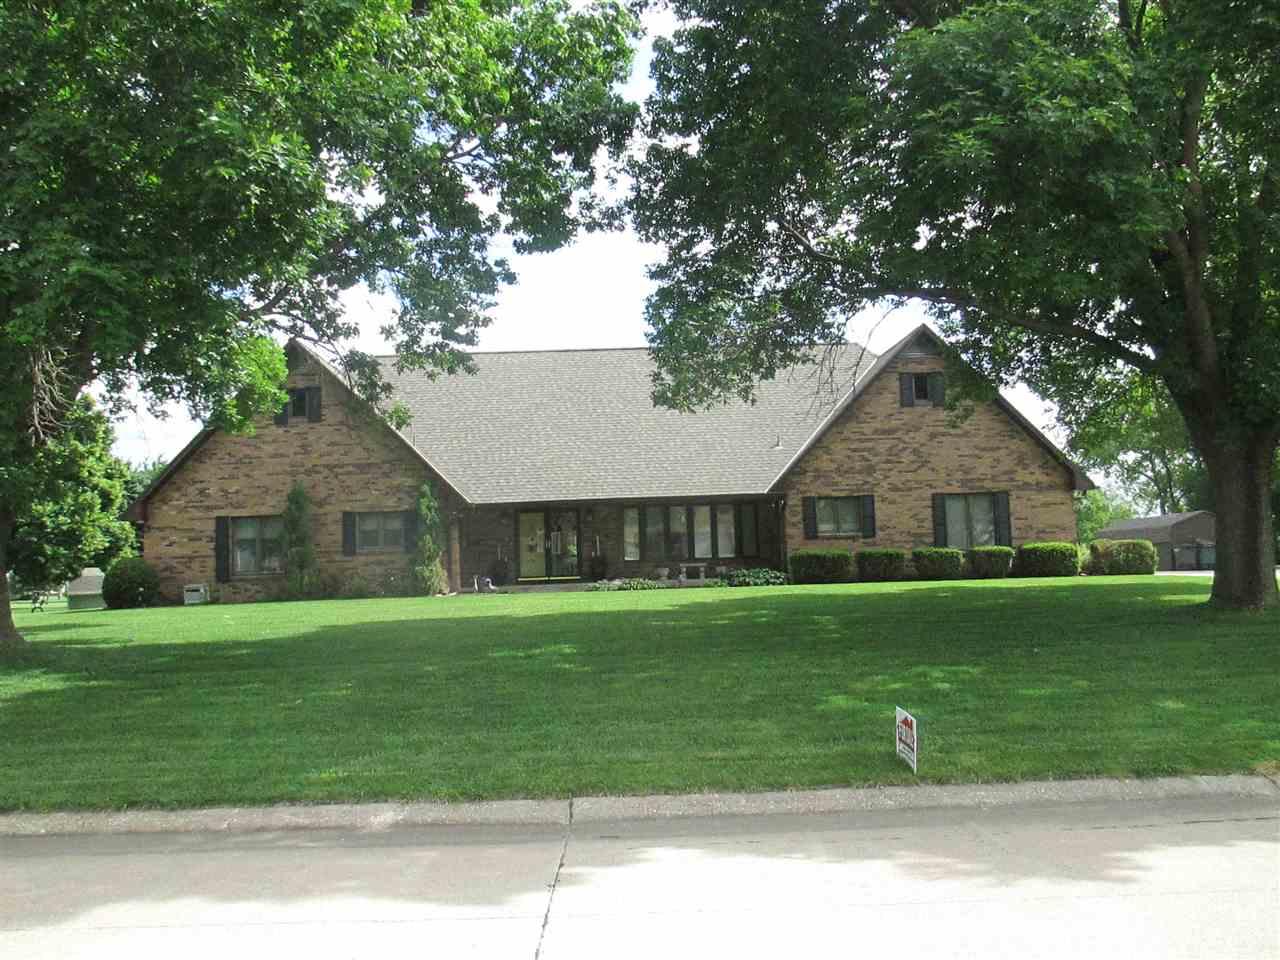 Real Estate for Sale, ListingId: 33776554, Hastings,NE68901